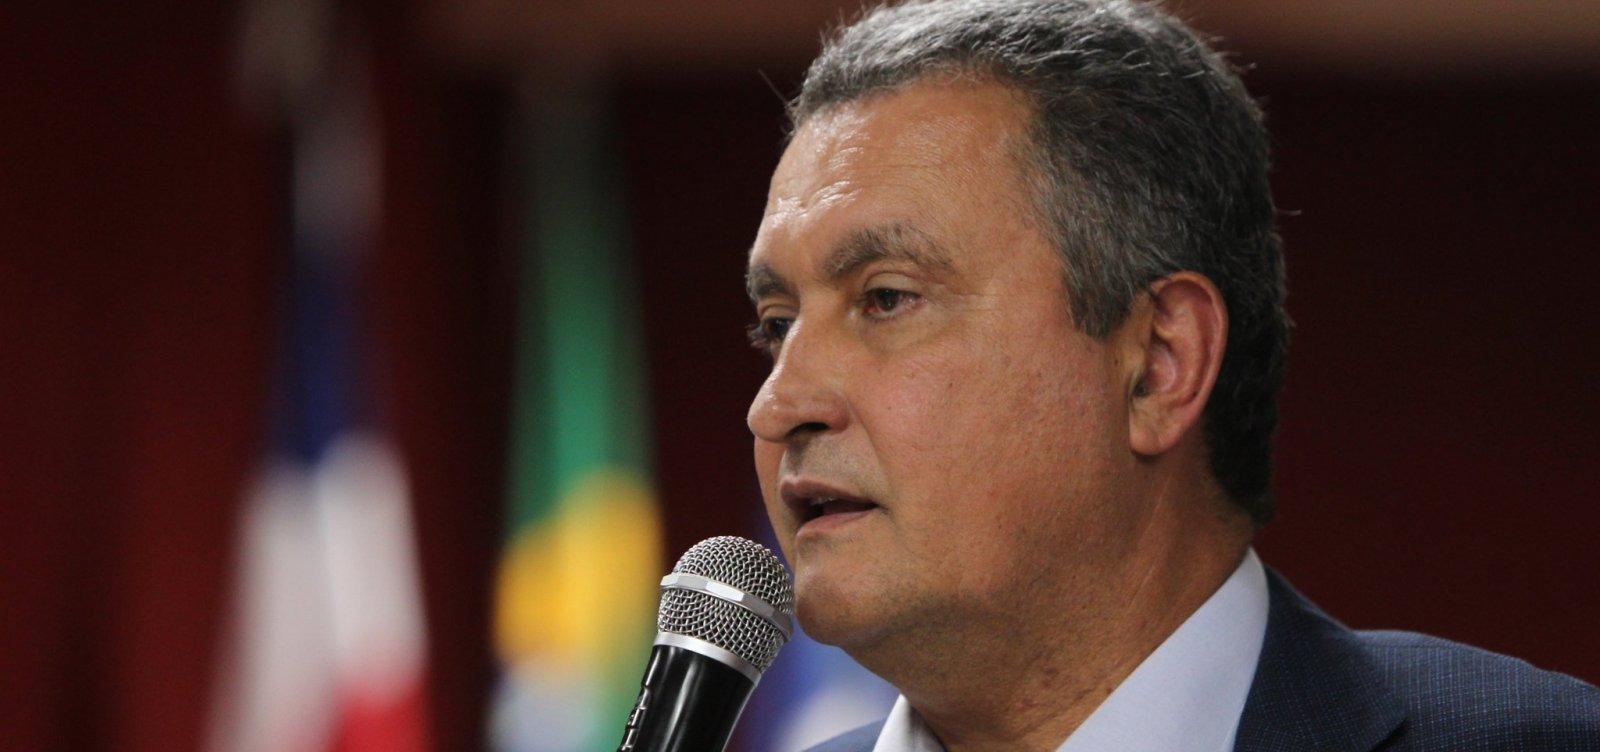 Rui Costa acredita em debandada de pepistas baianos após Ciro Nogueira aceitar convite de Bolsonaro